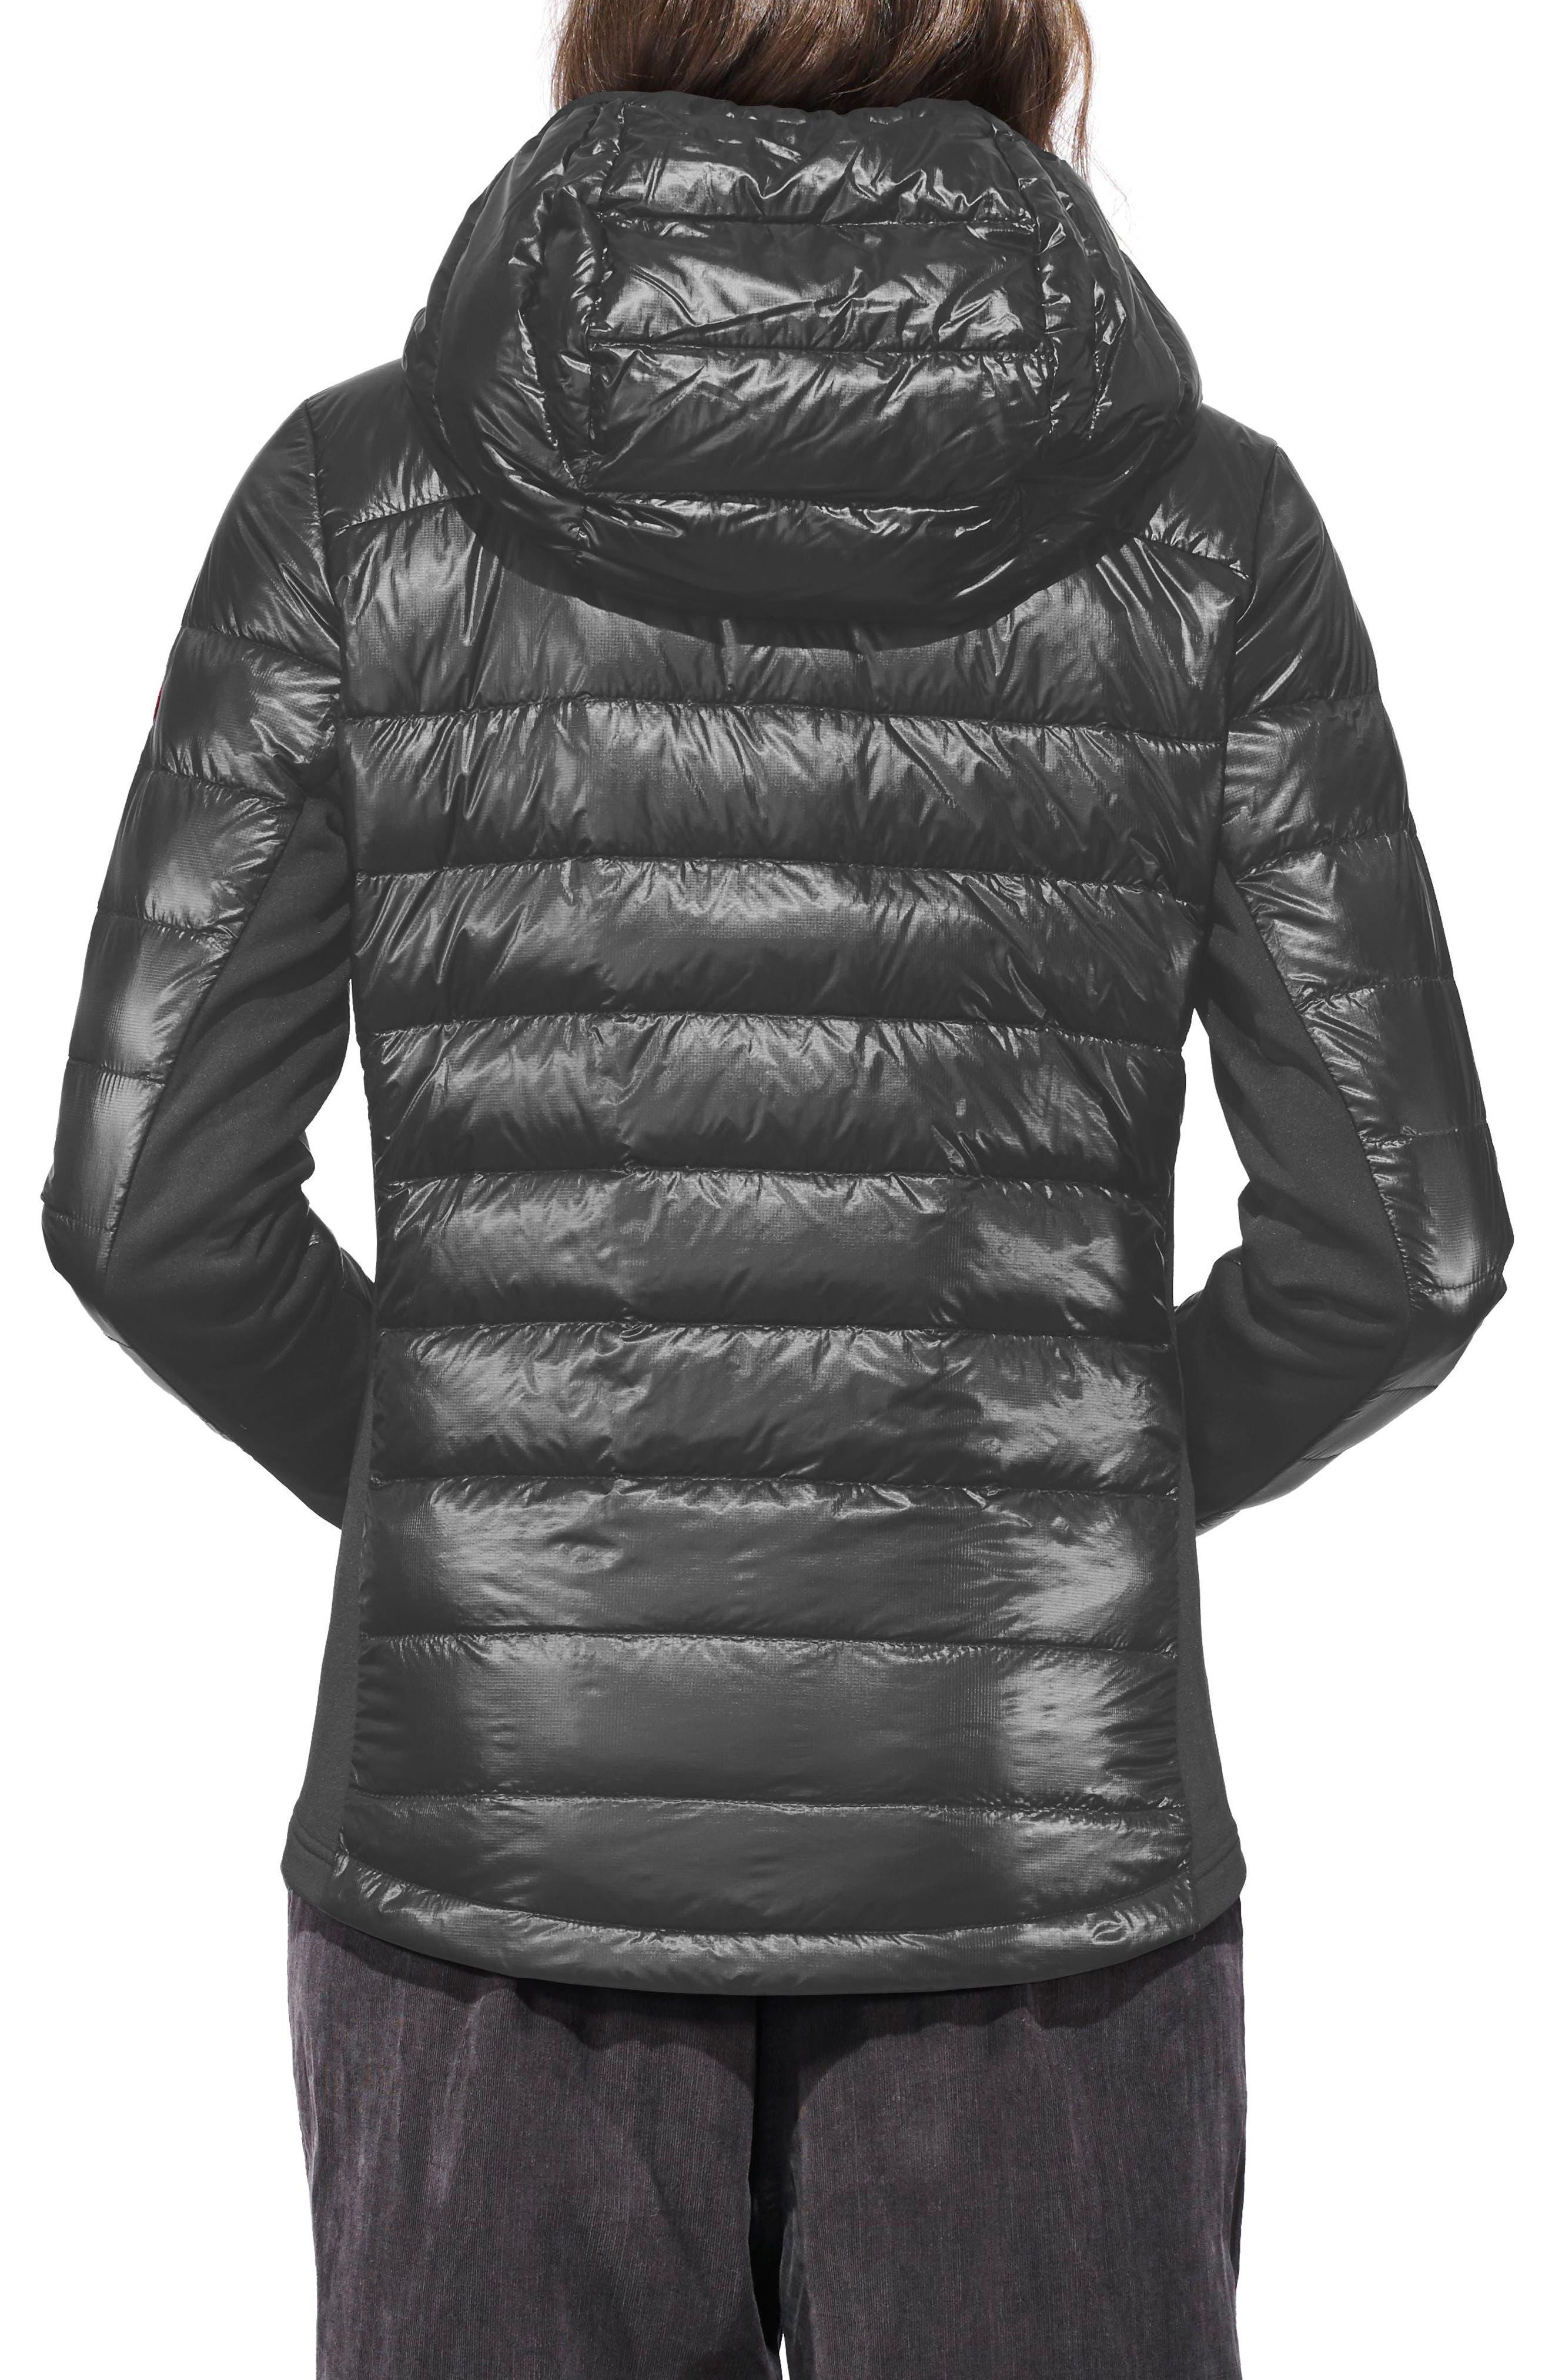 CANADA GOOSE, 'Hybridge Lite' Slim Fit Hooded Packable Down Jacket, Alternate thumbnail 2, color, S GRAPHITE/ L BLACK